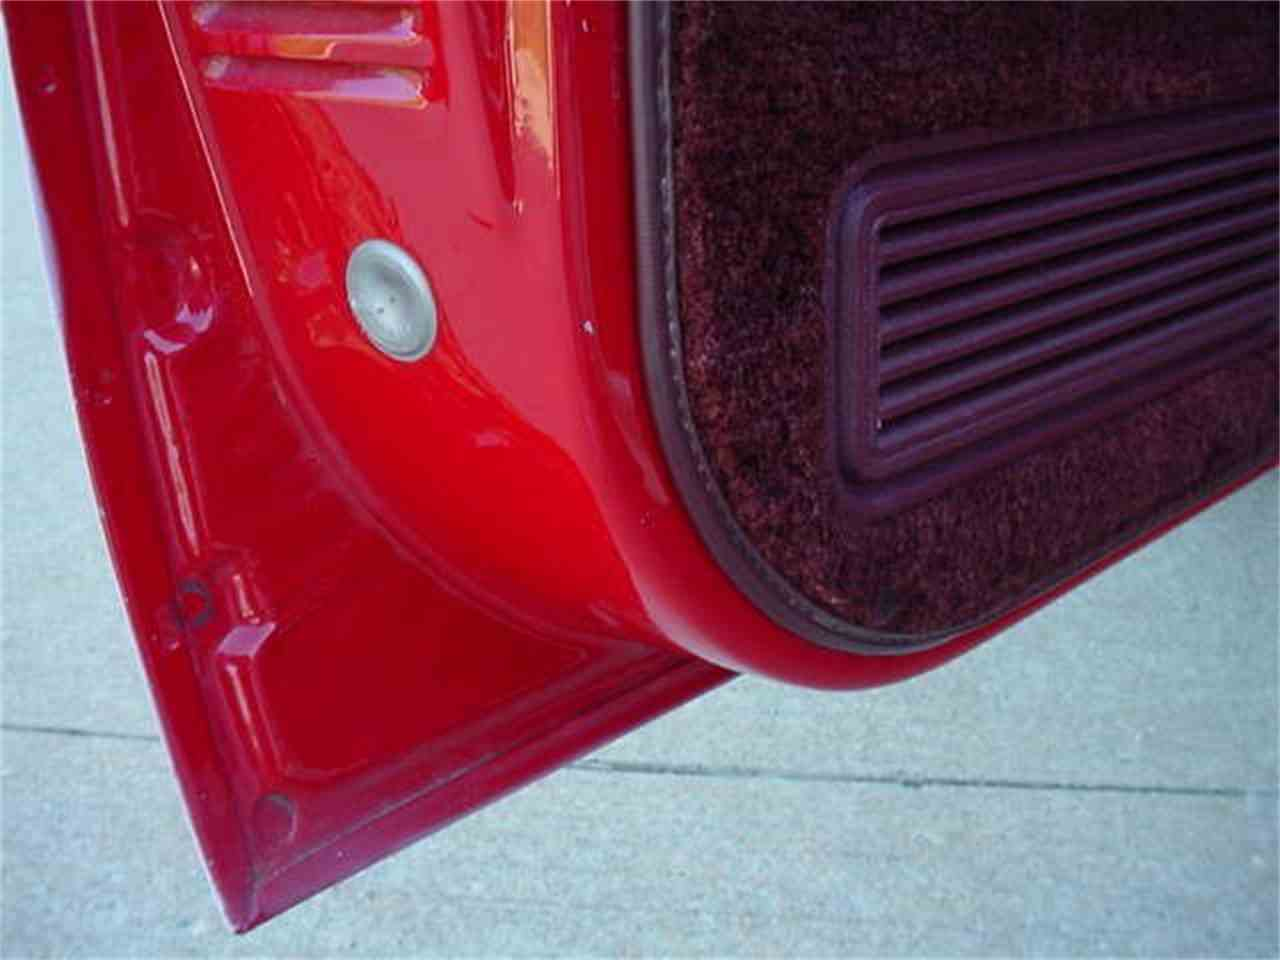 Large Picture of 1986 Chevrolet Silverado located in Milford Ohio - $10,950.00 - M60C